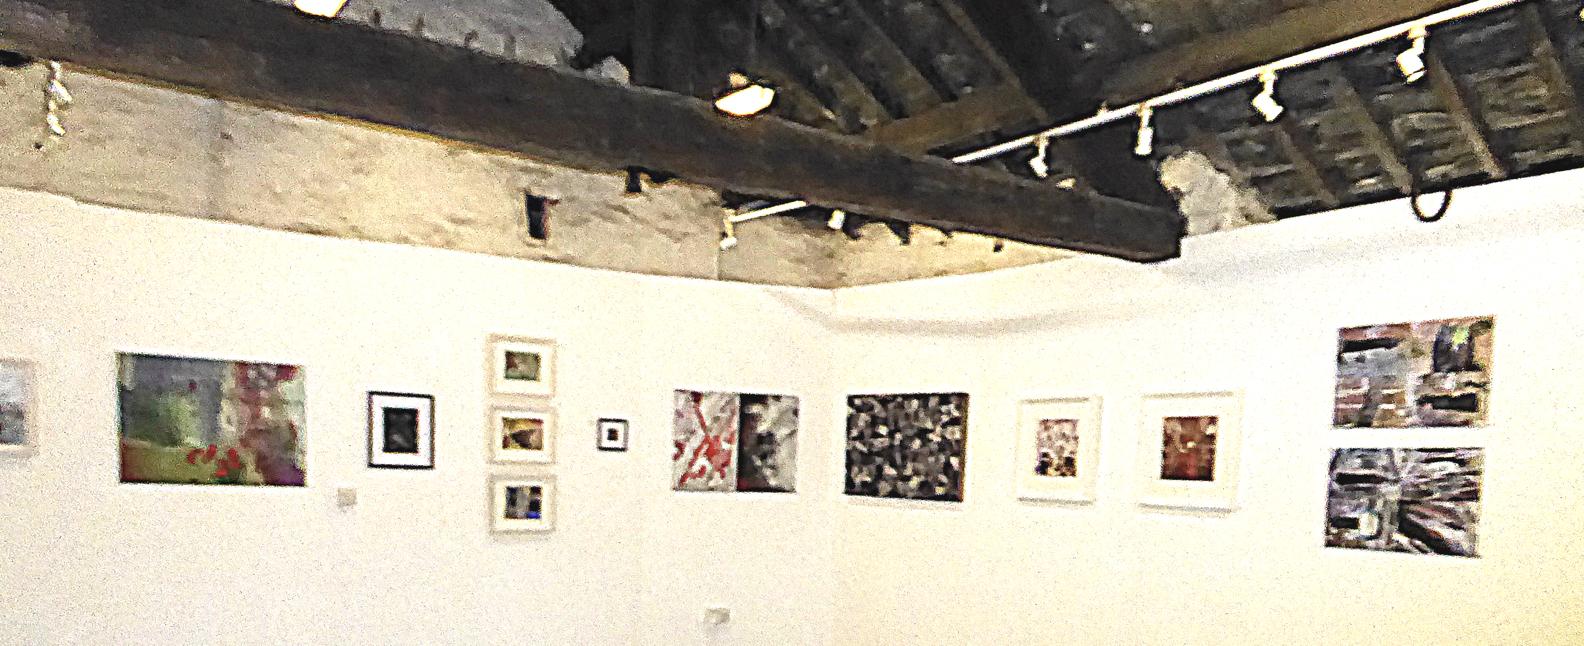 32 Ouroboros Exhib 1 for web